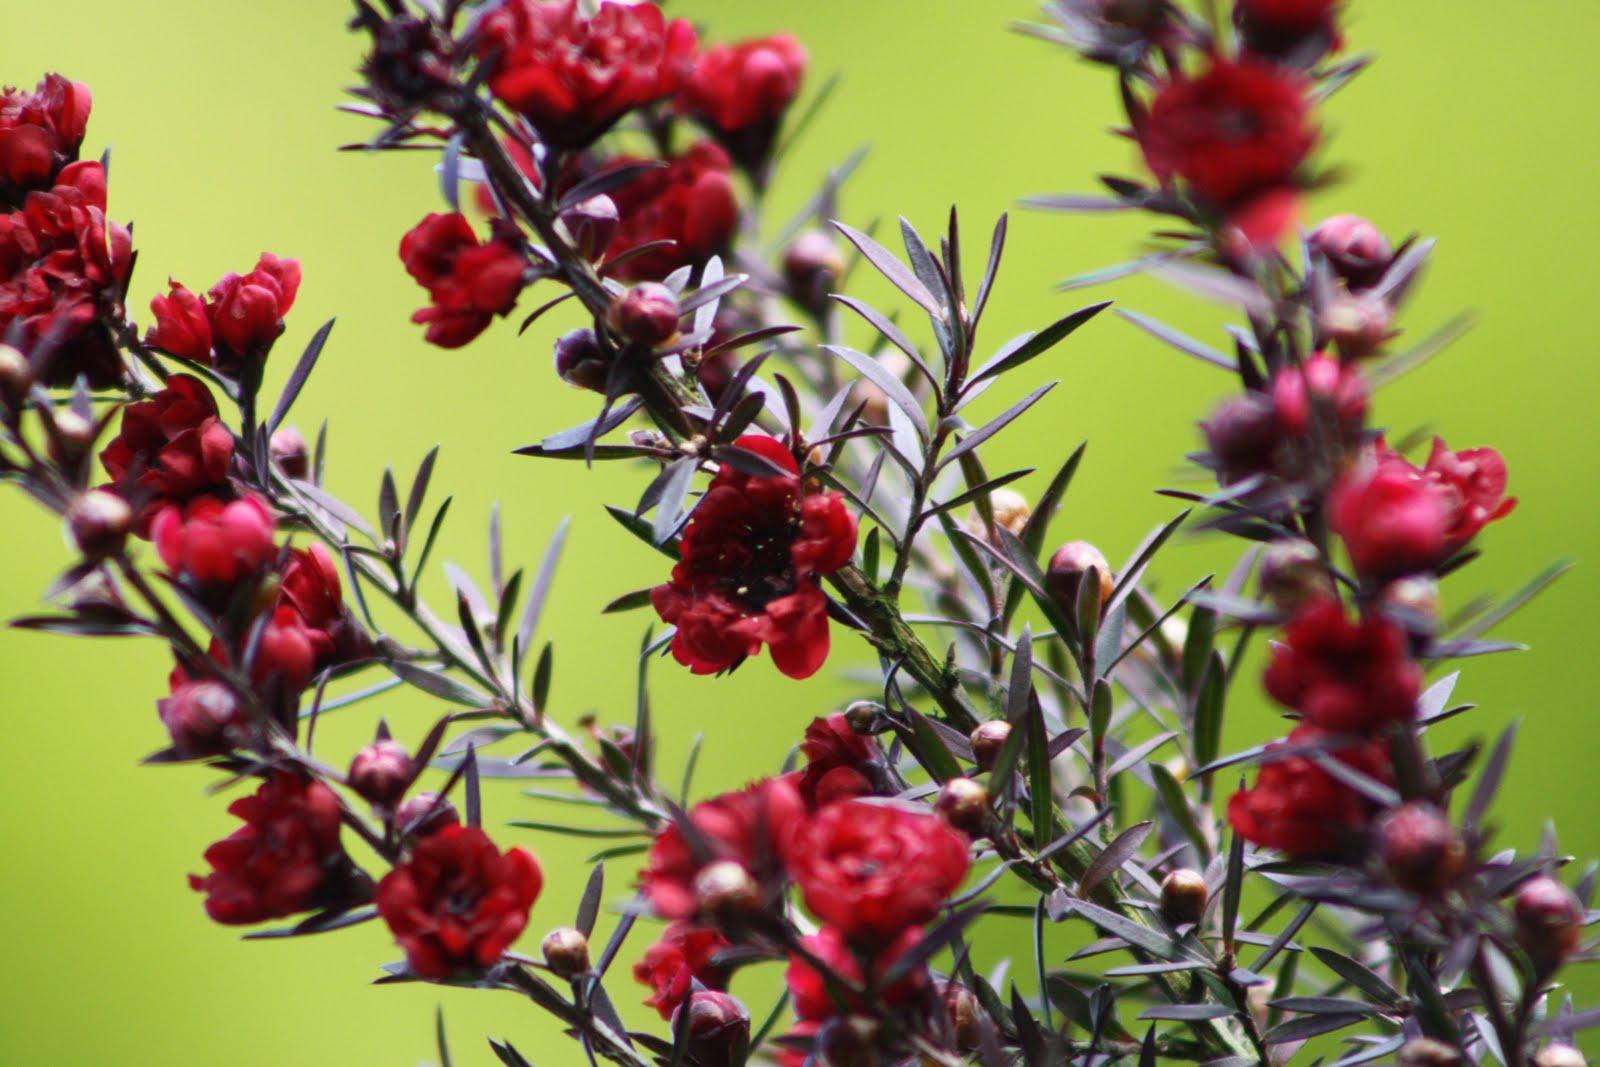 El jard n de margarita leptospermun scoparium - Arbusto pequeno con flores ...